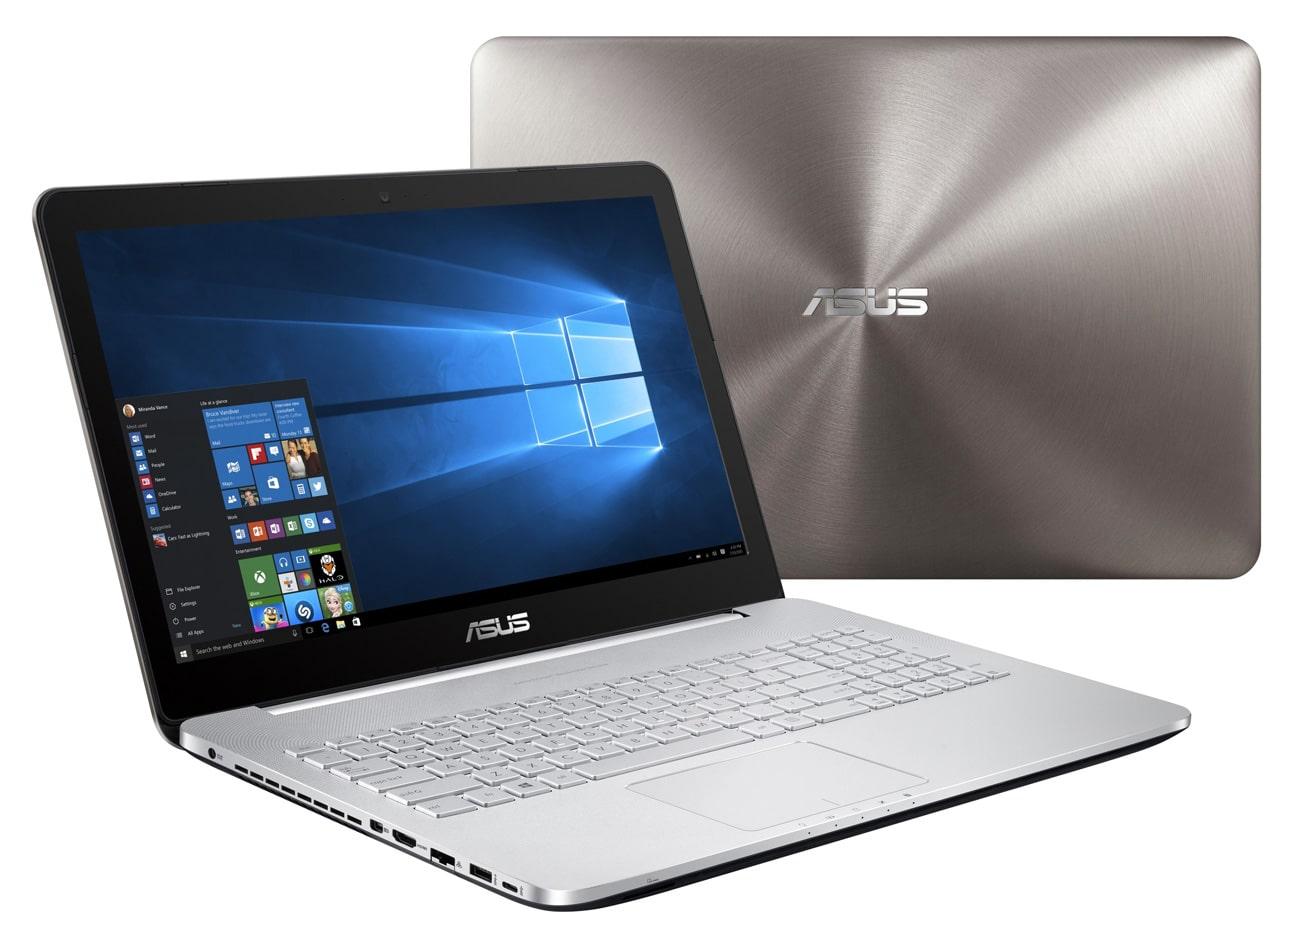 Asus N552VW-FI270T, PC portable 15 pouces 4K IPS SSD512 i7 960M à 1615€